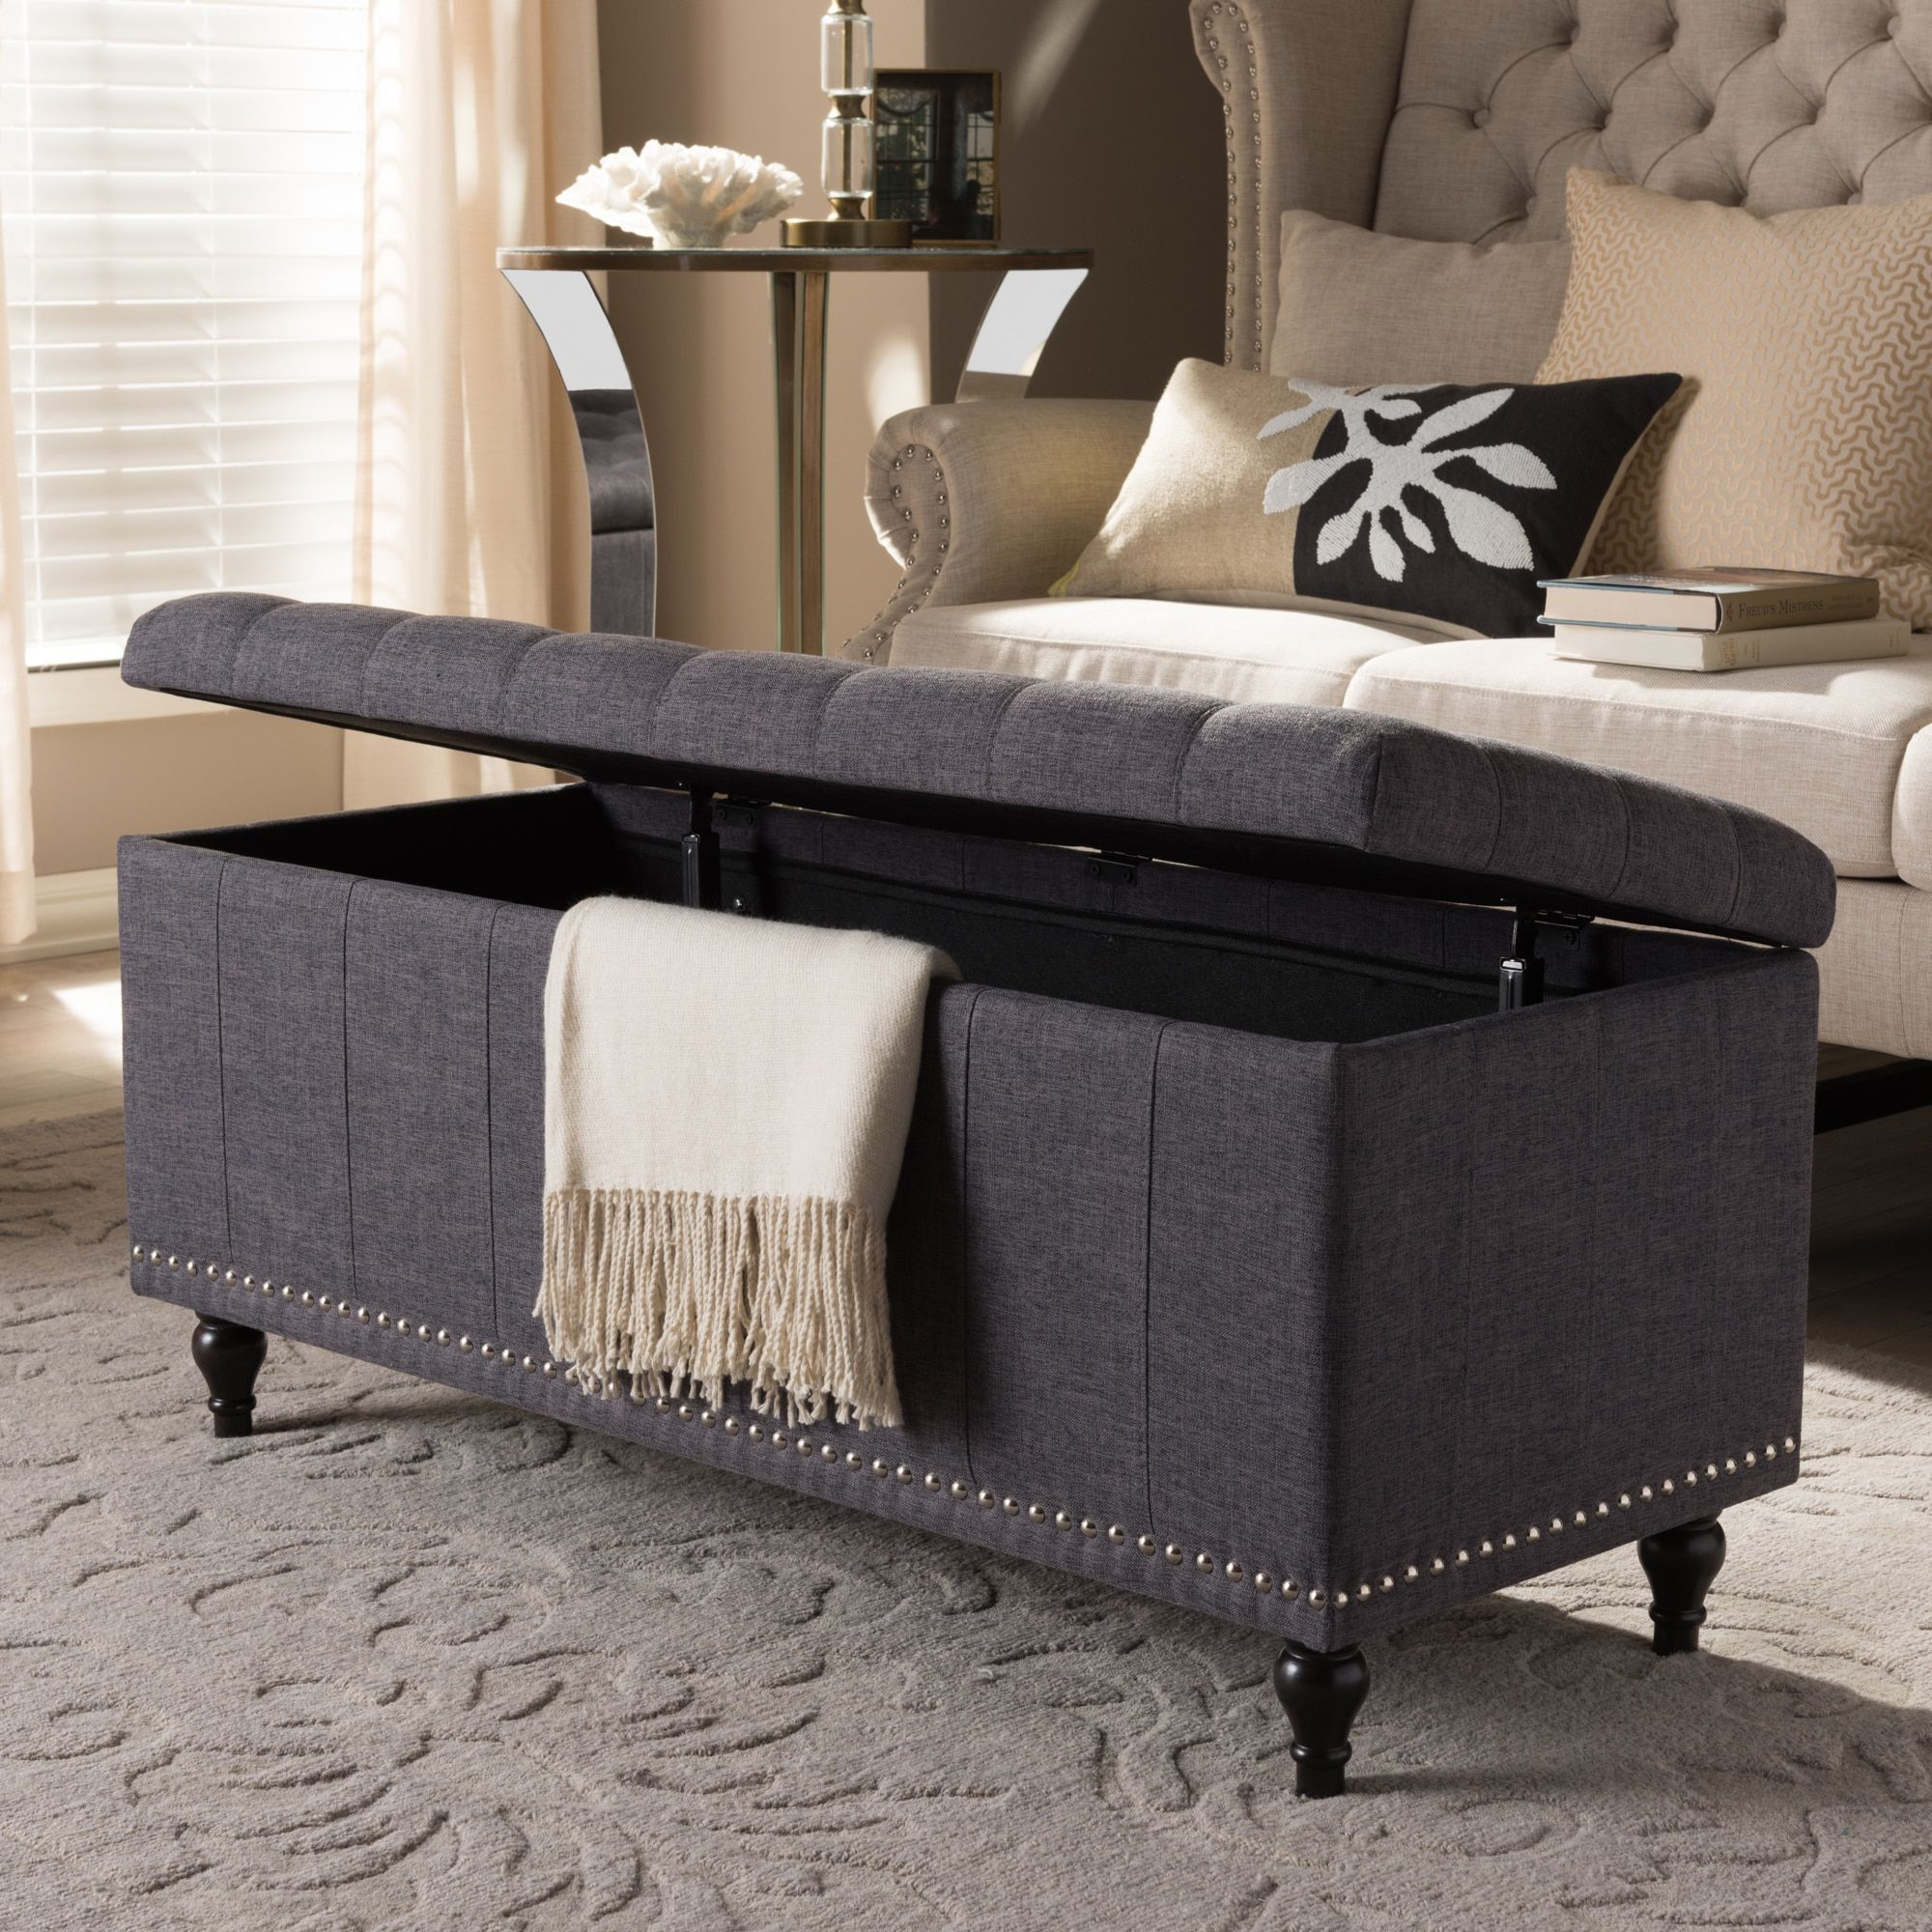 Enjoyable Baxton Studio Alexio Modern Classic Dark Grey Fabric Inzonedesignstudio Interior Chair Design Inzonedesignstudiocom